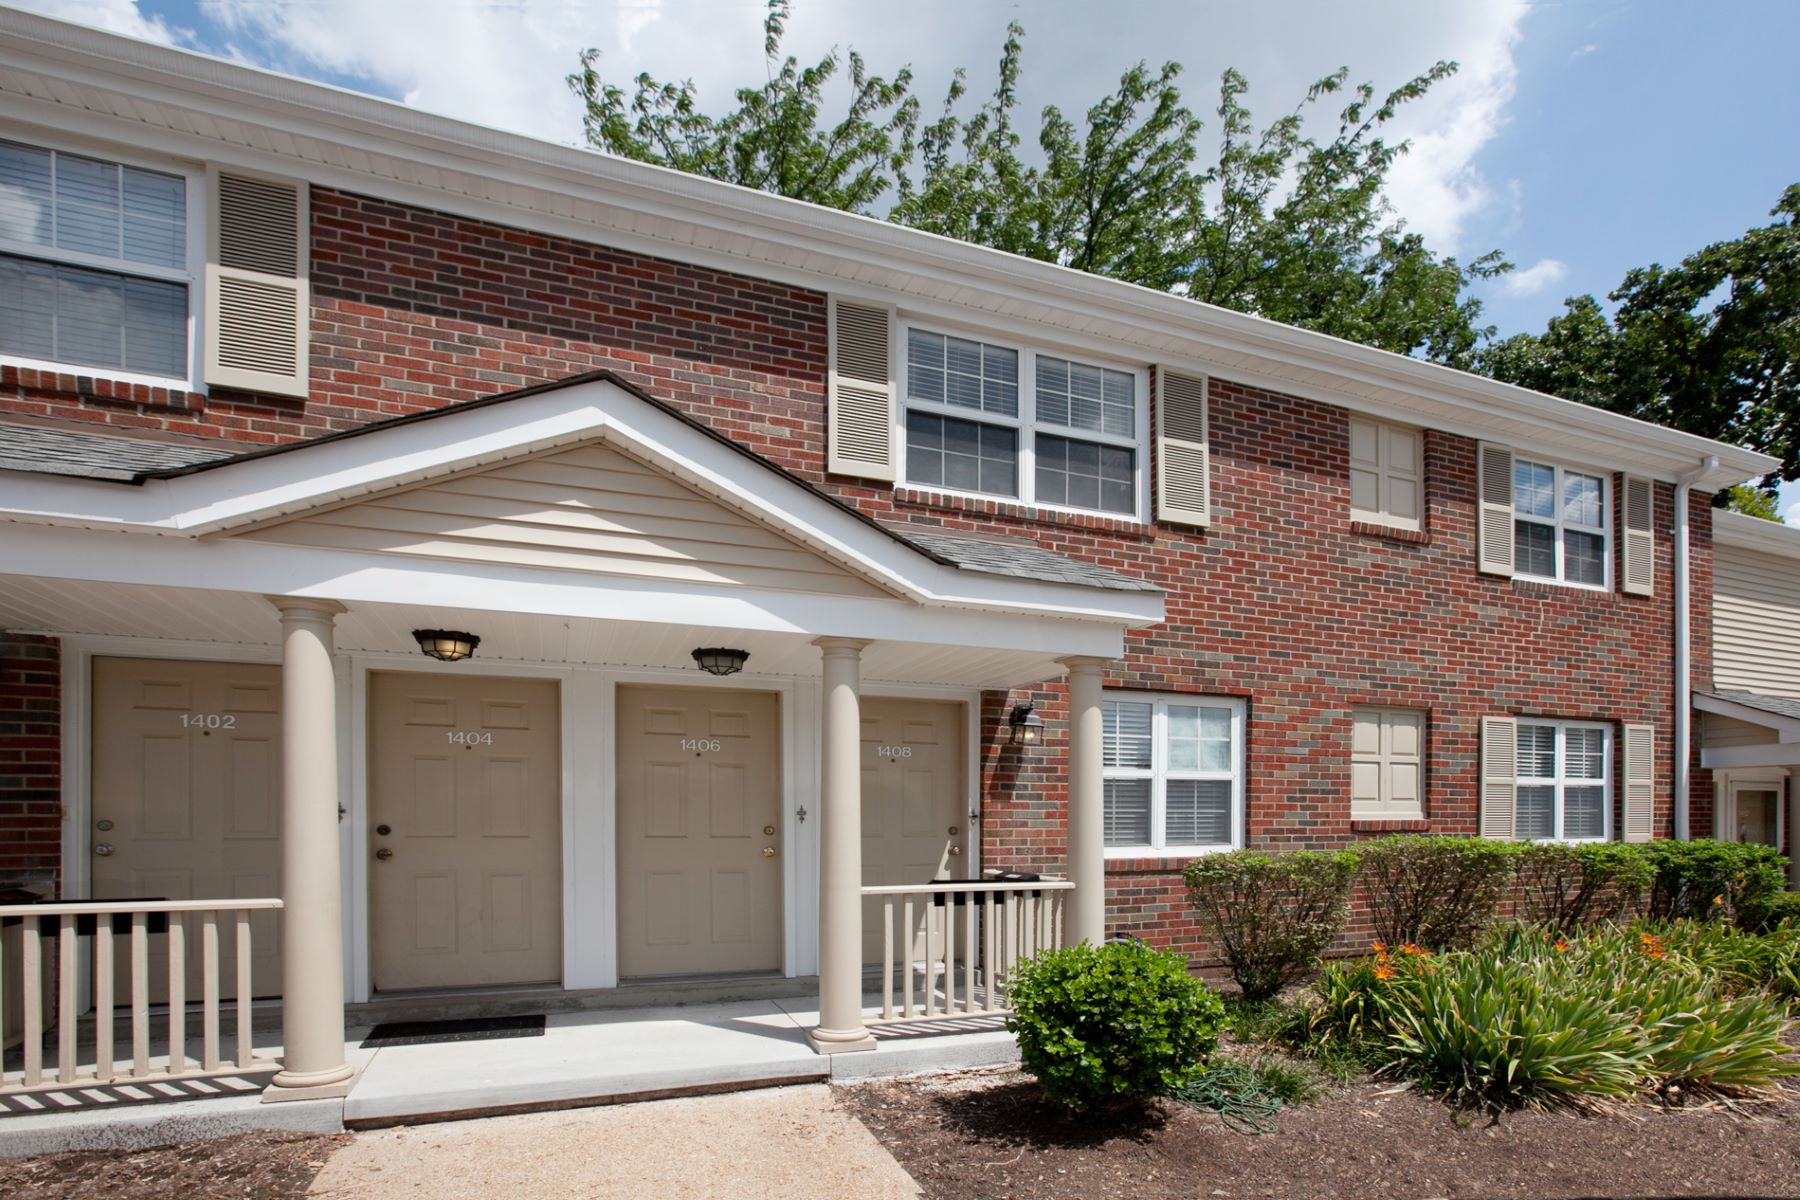 Condominium for Sale at Thrush Place 1406 Thrush Place Brentwood, Missouri 63144 United States